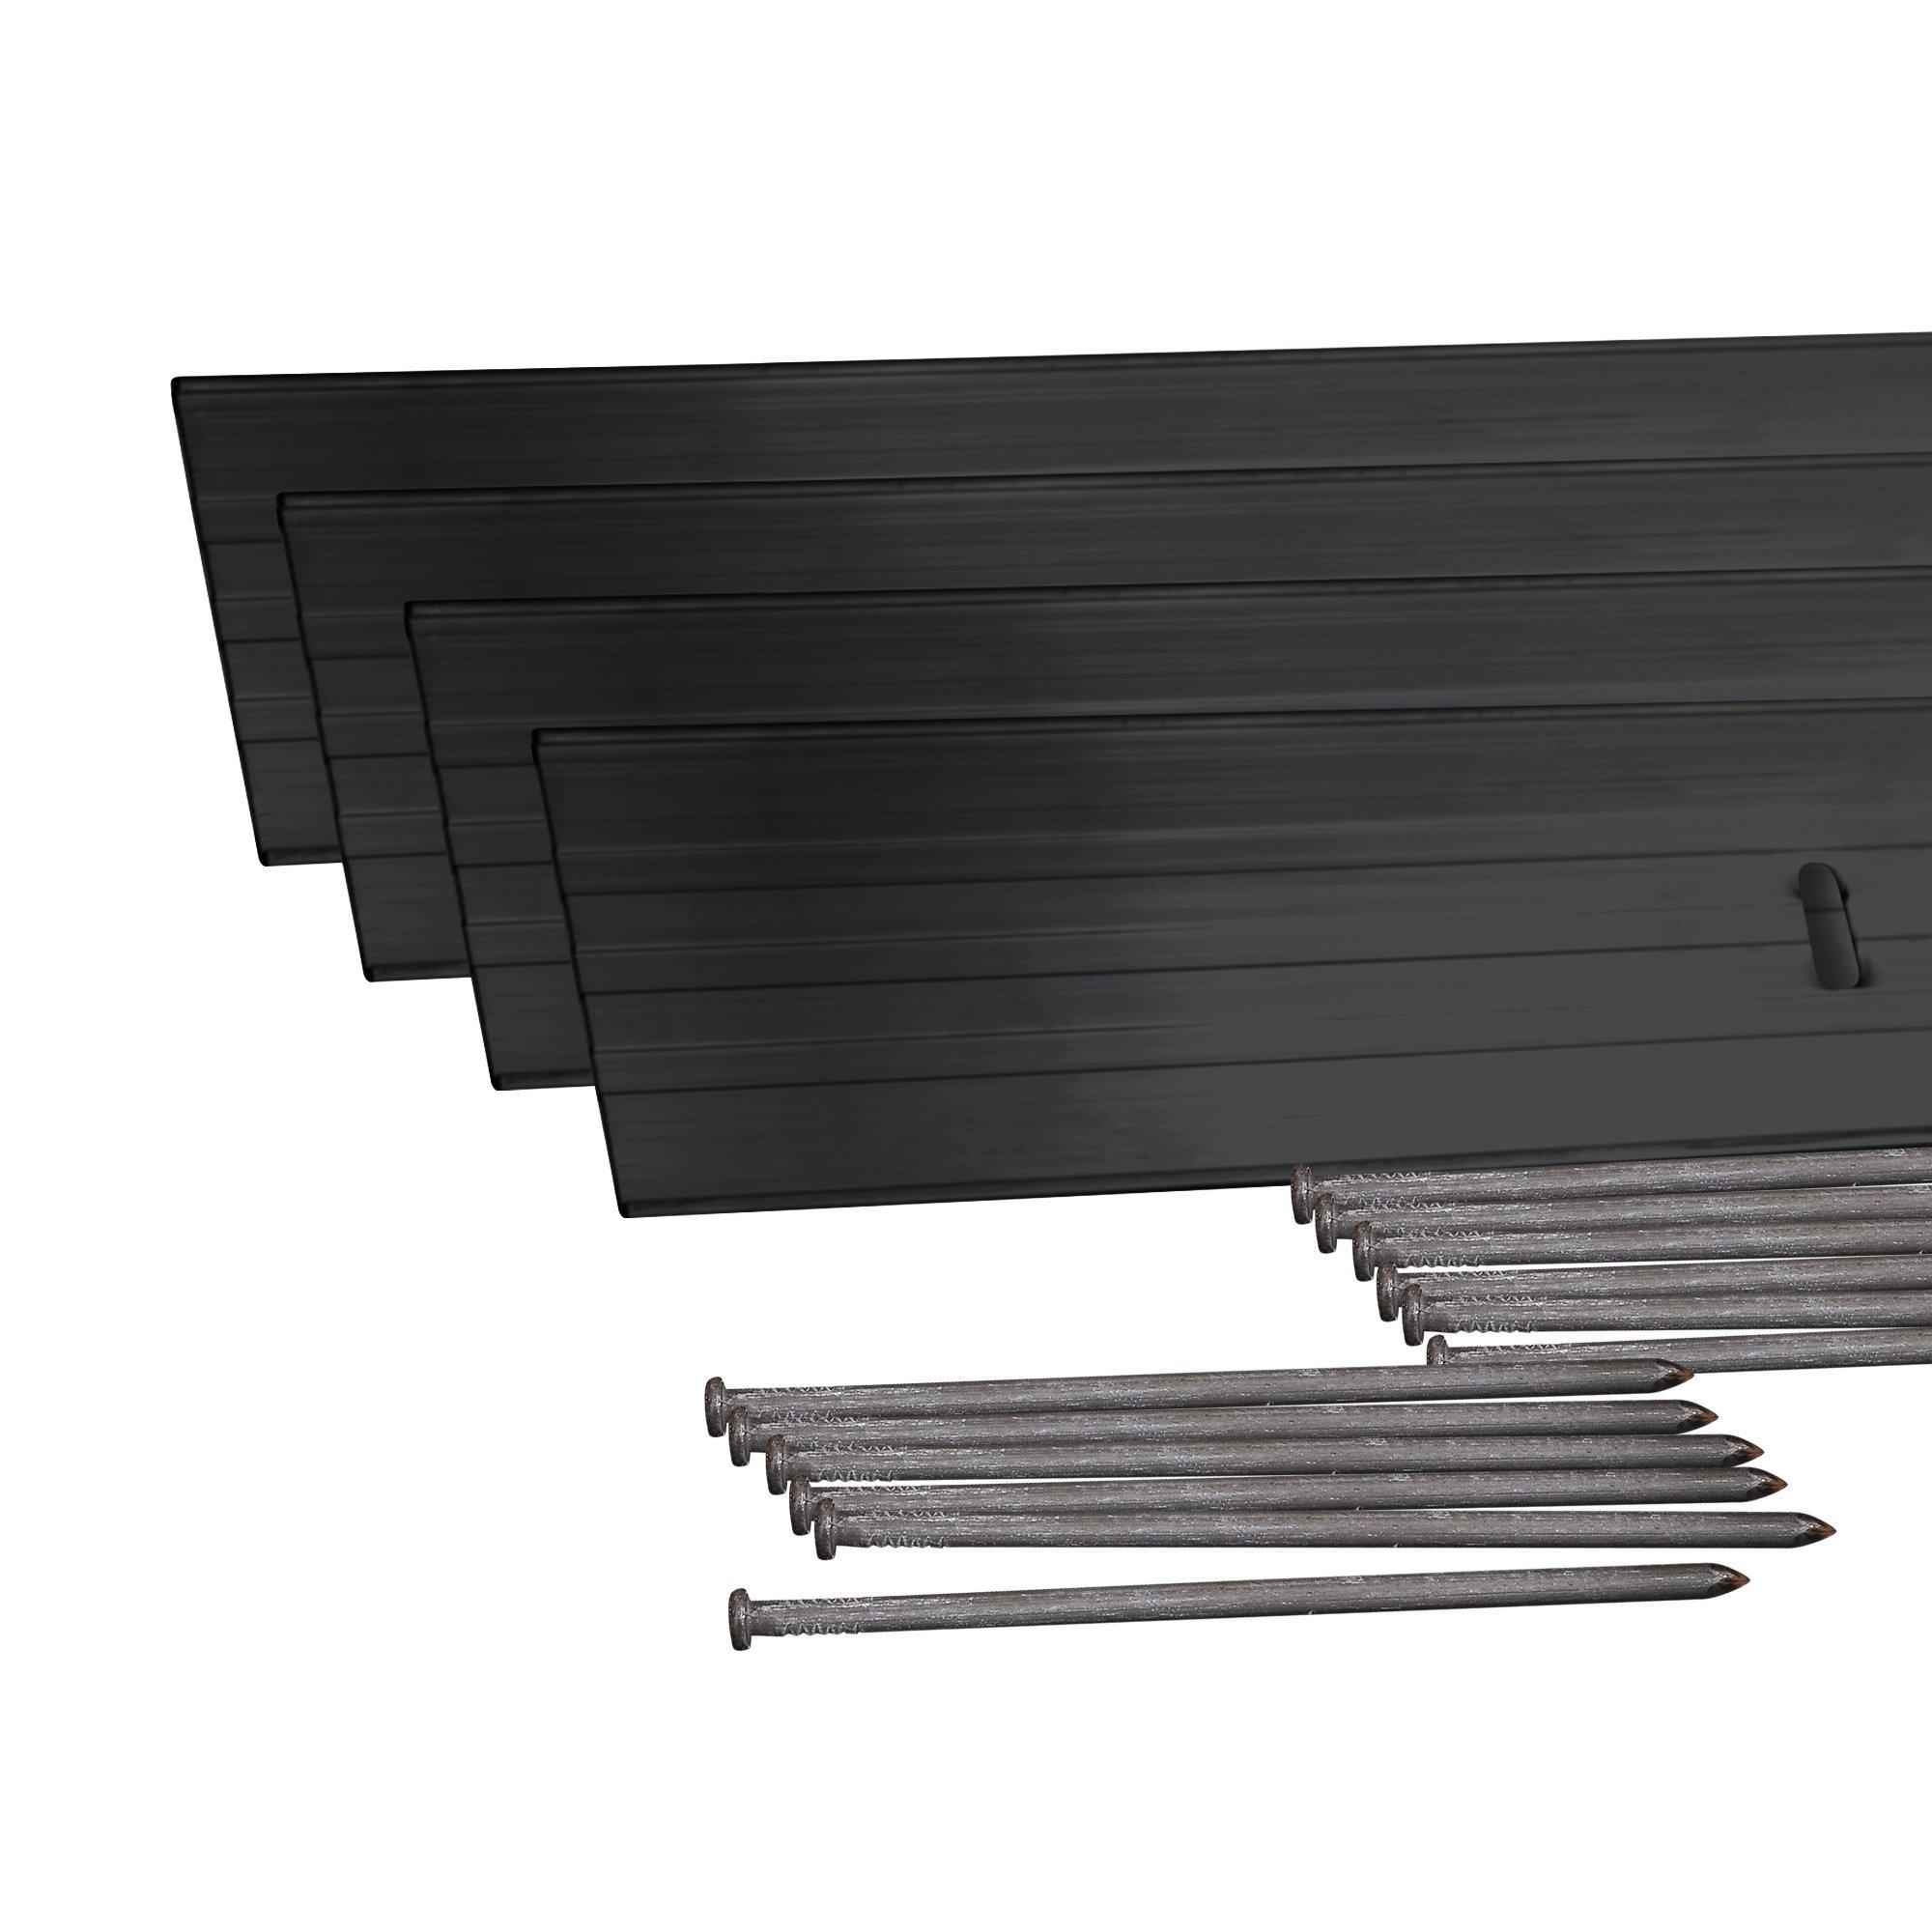 Dimex EasyFlex Aluminum Landscape 1806BK 24C